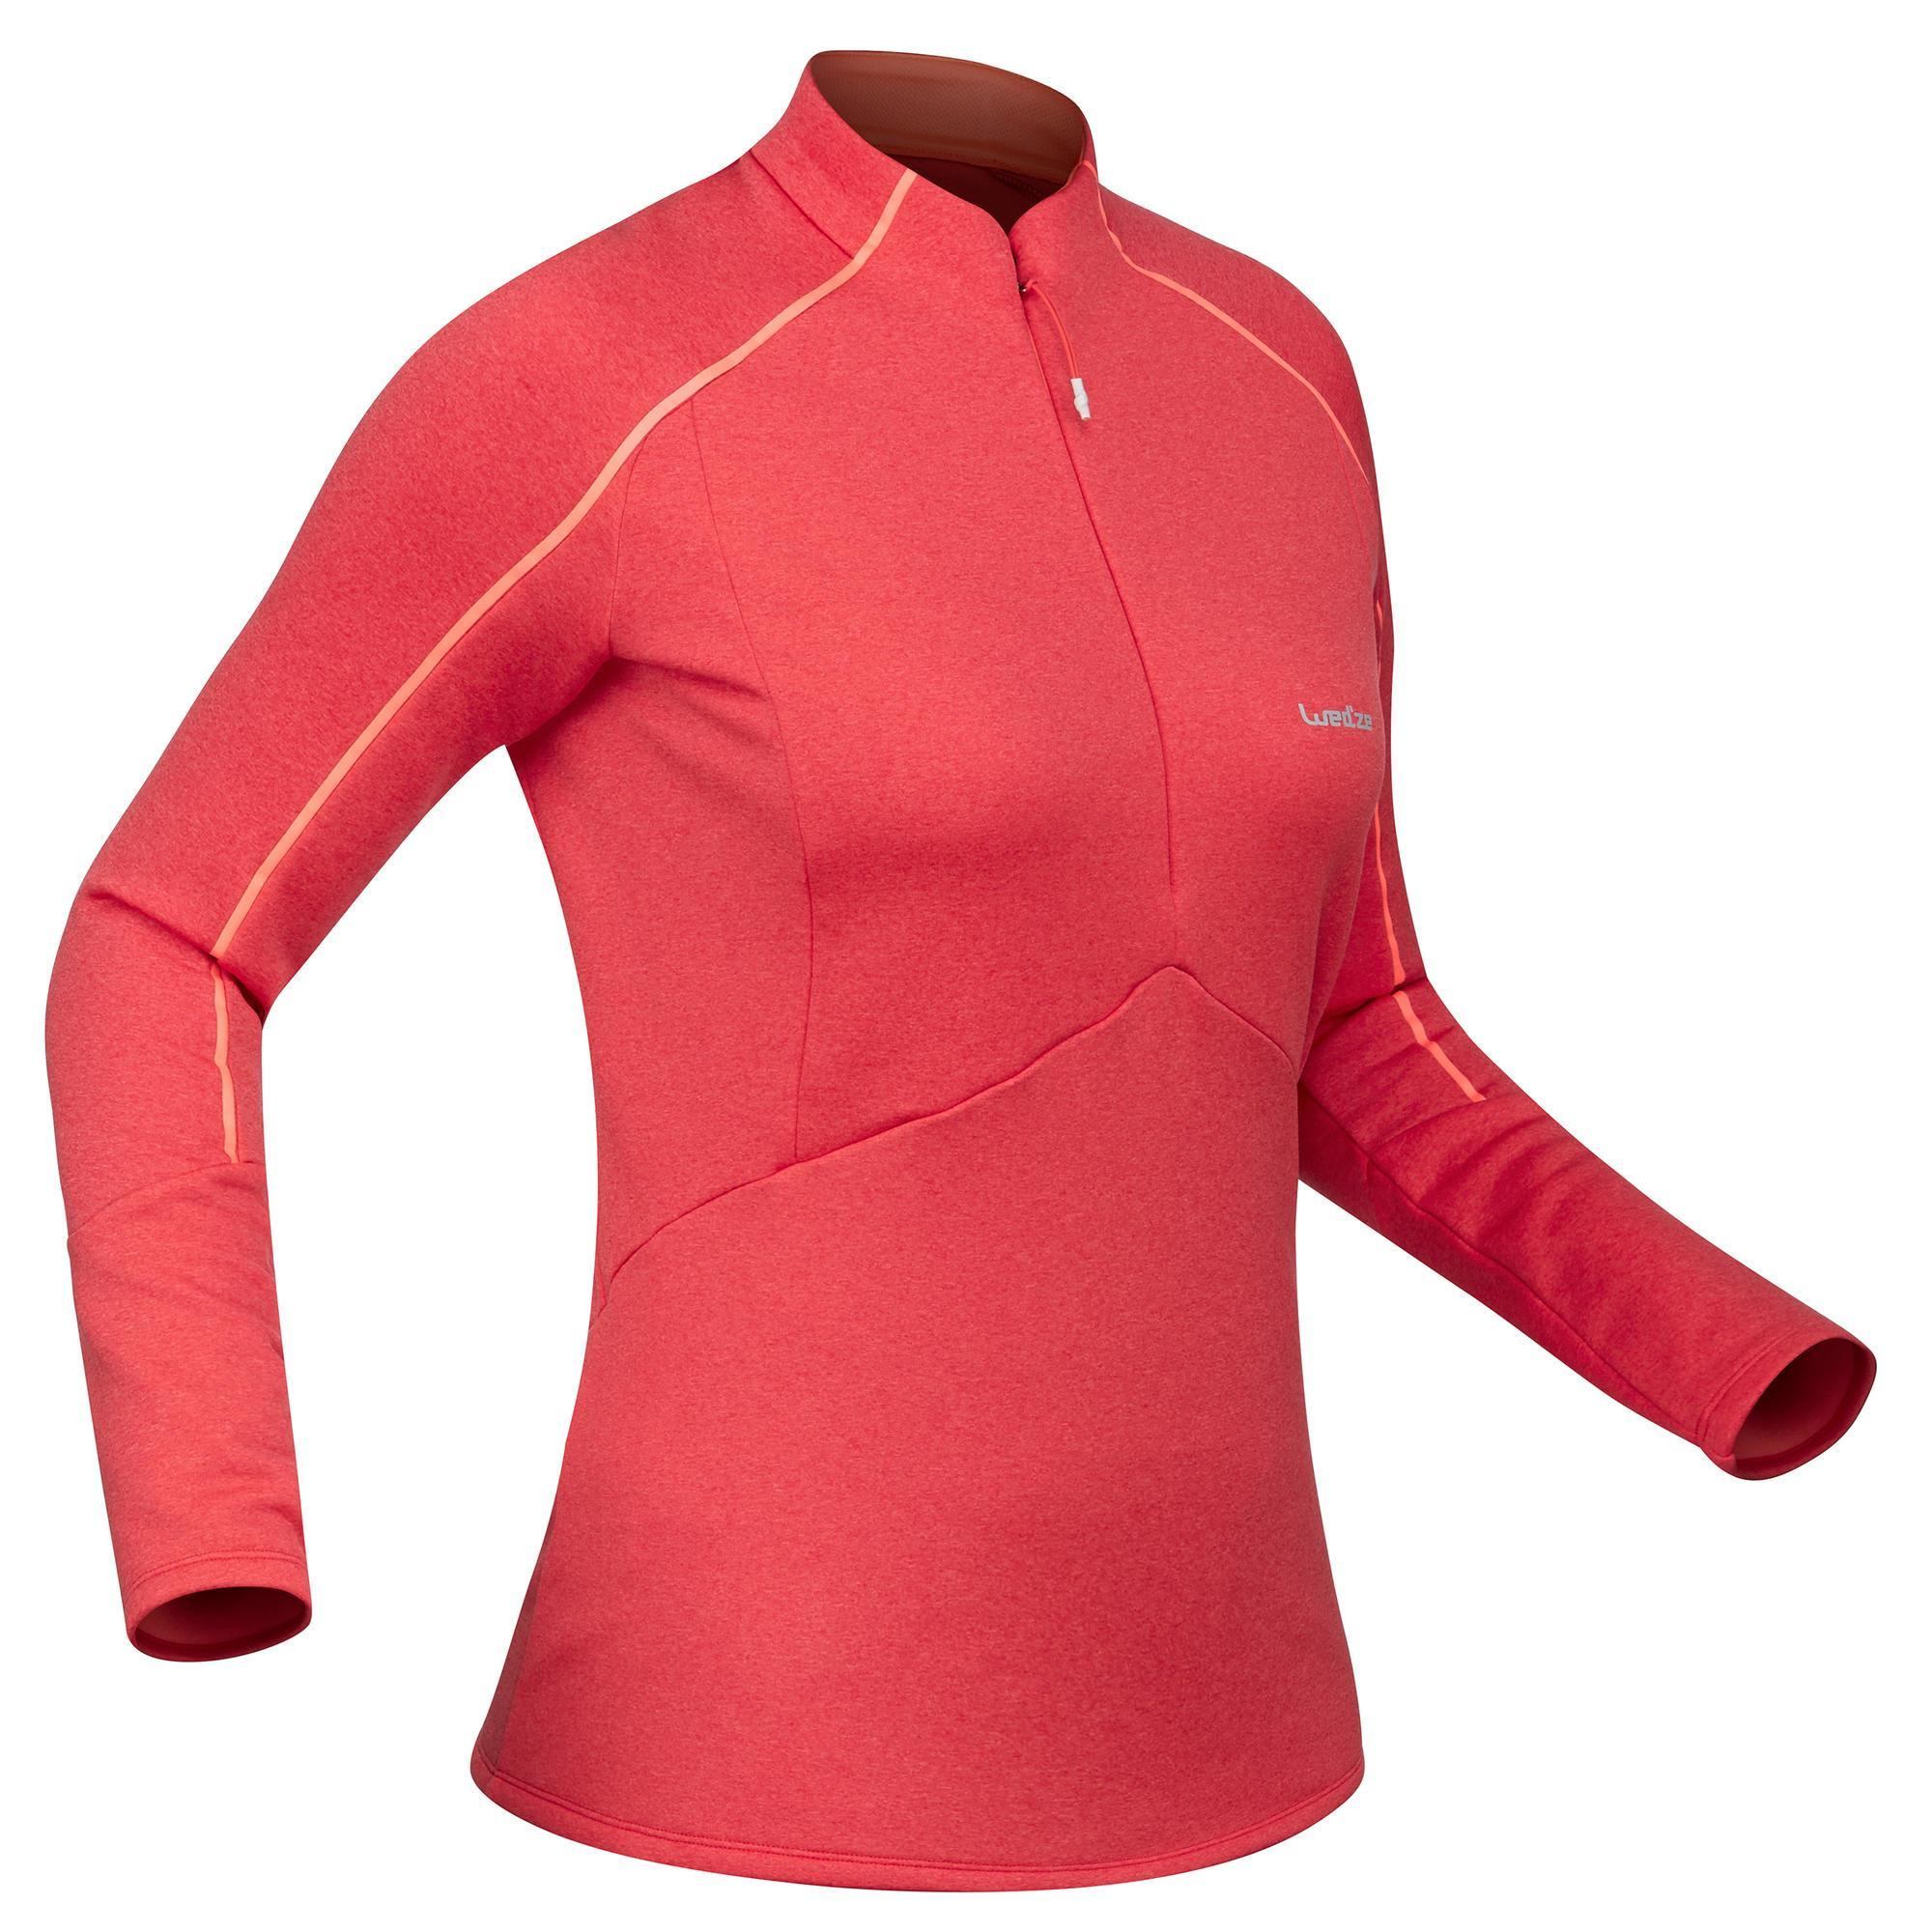 Skiunterhemd 500 Damen rosa | Sportbekleidung > Funktionswäsche > Thermounterwäsche | Rosa | Wed'ze